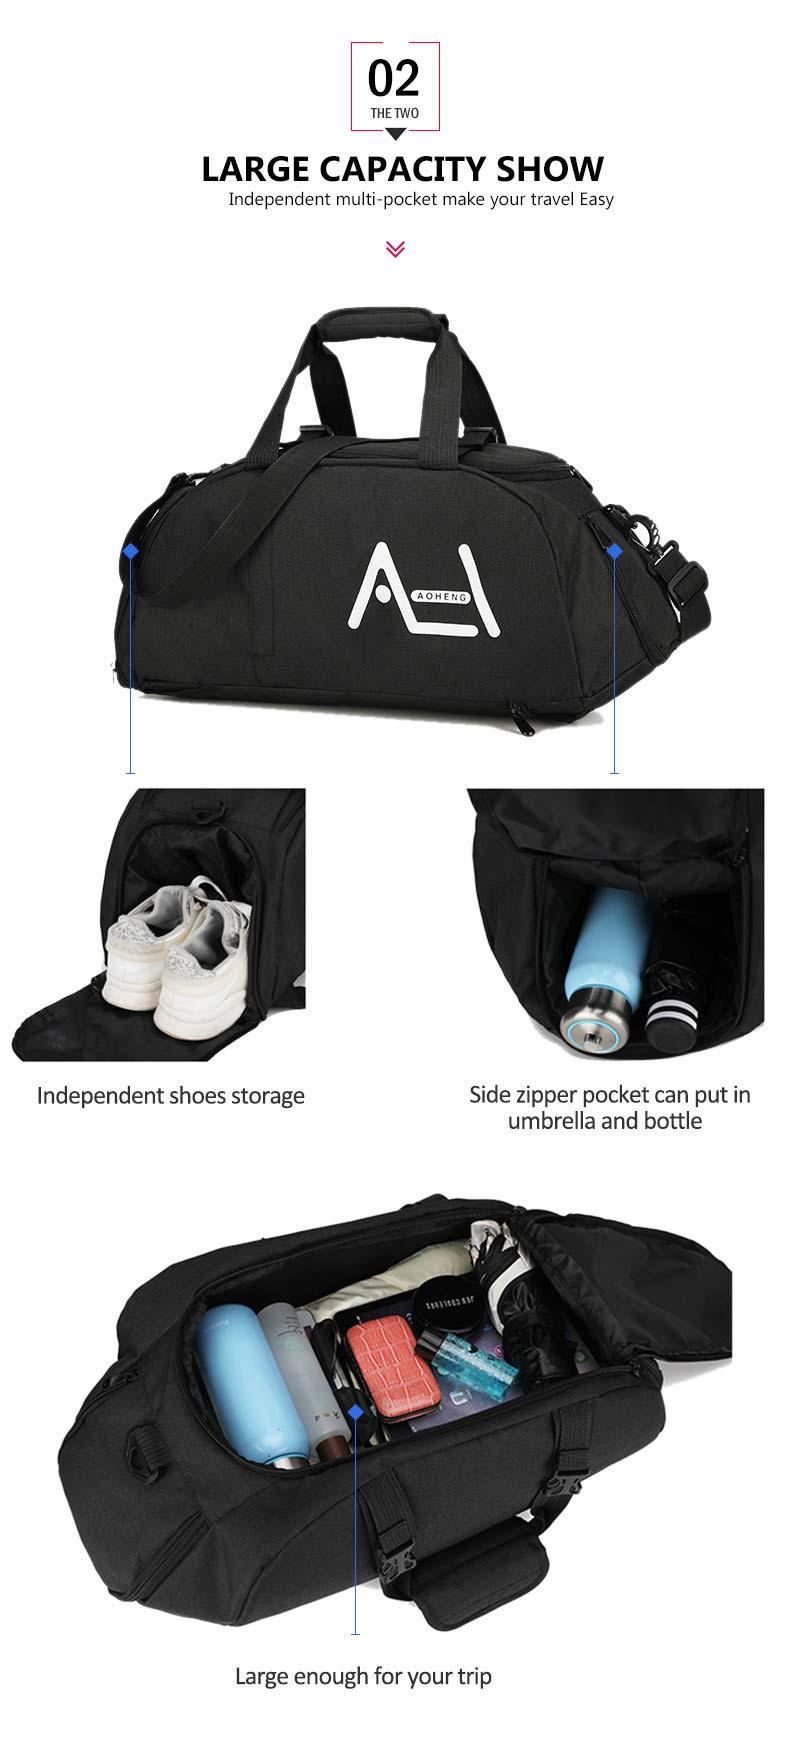 Women Gym Bags Sac De Sport For Fitness Training Men Sporttas Sports Backpack Travel Bag Yoga Luggage Mochila Shoulder Tas XA20A